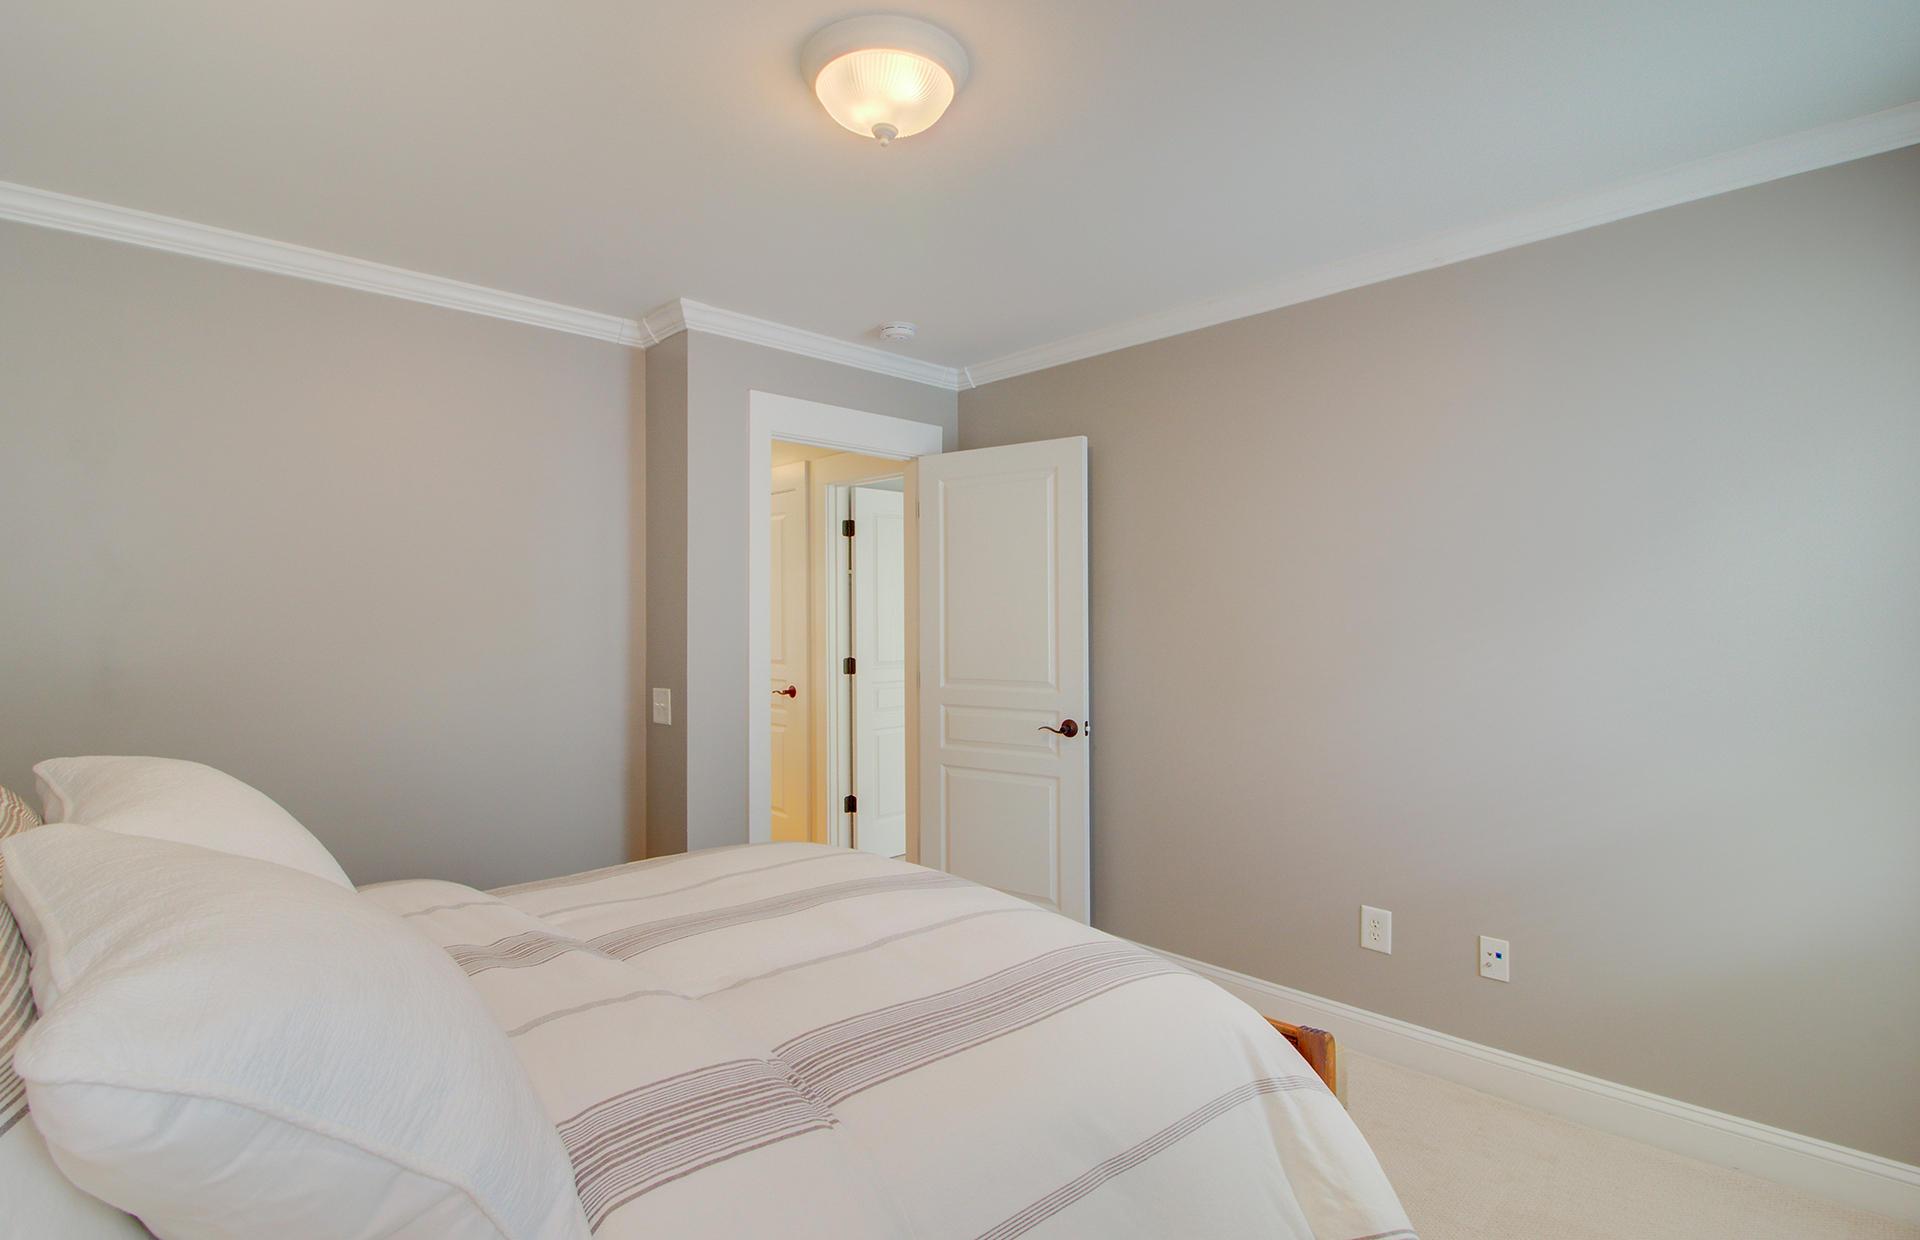 New Parrish Village Homes For Sale - 1109 Dawn View, Mount Pleasant, SC - 33